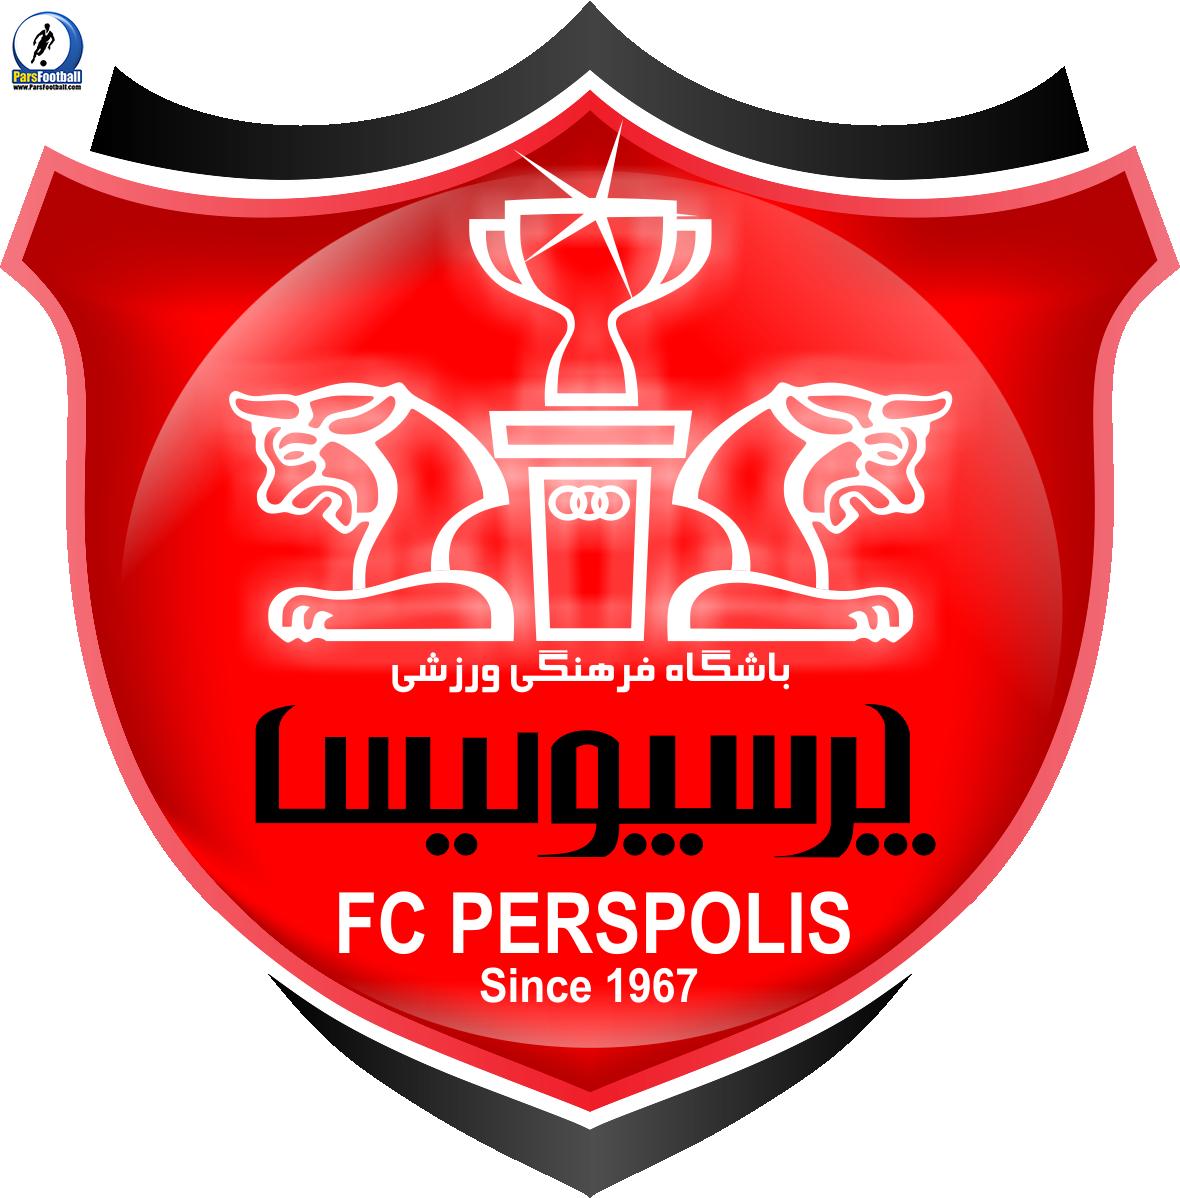 Perspolis